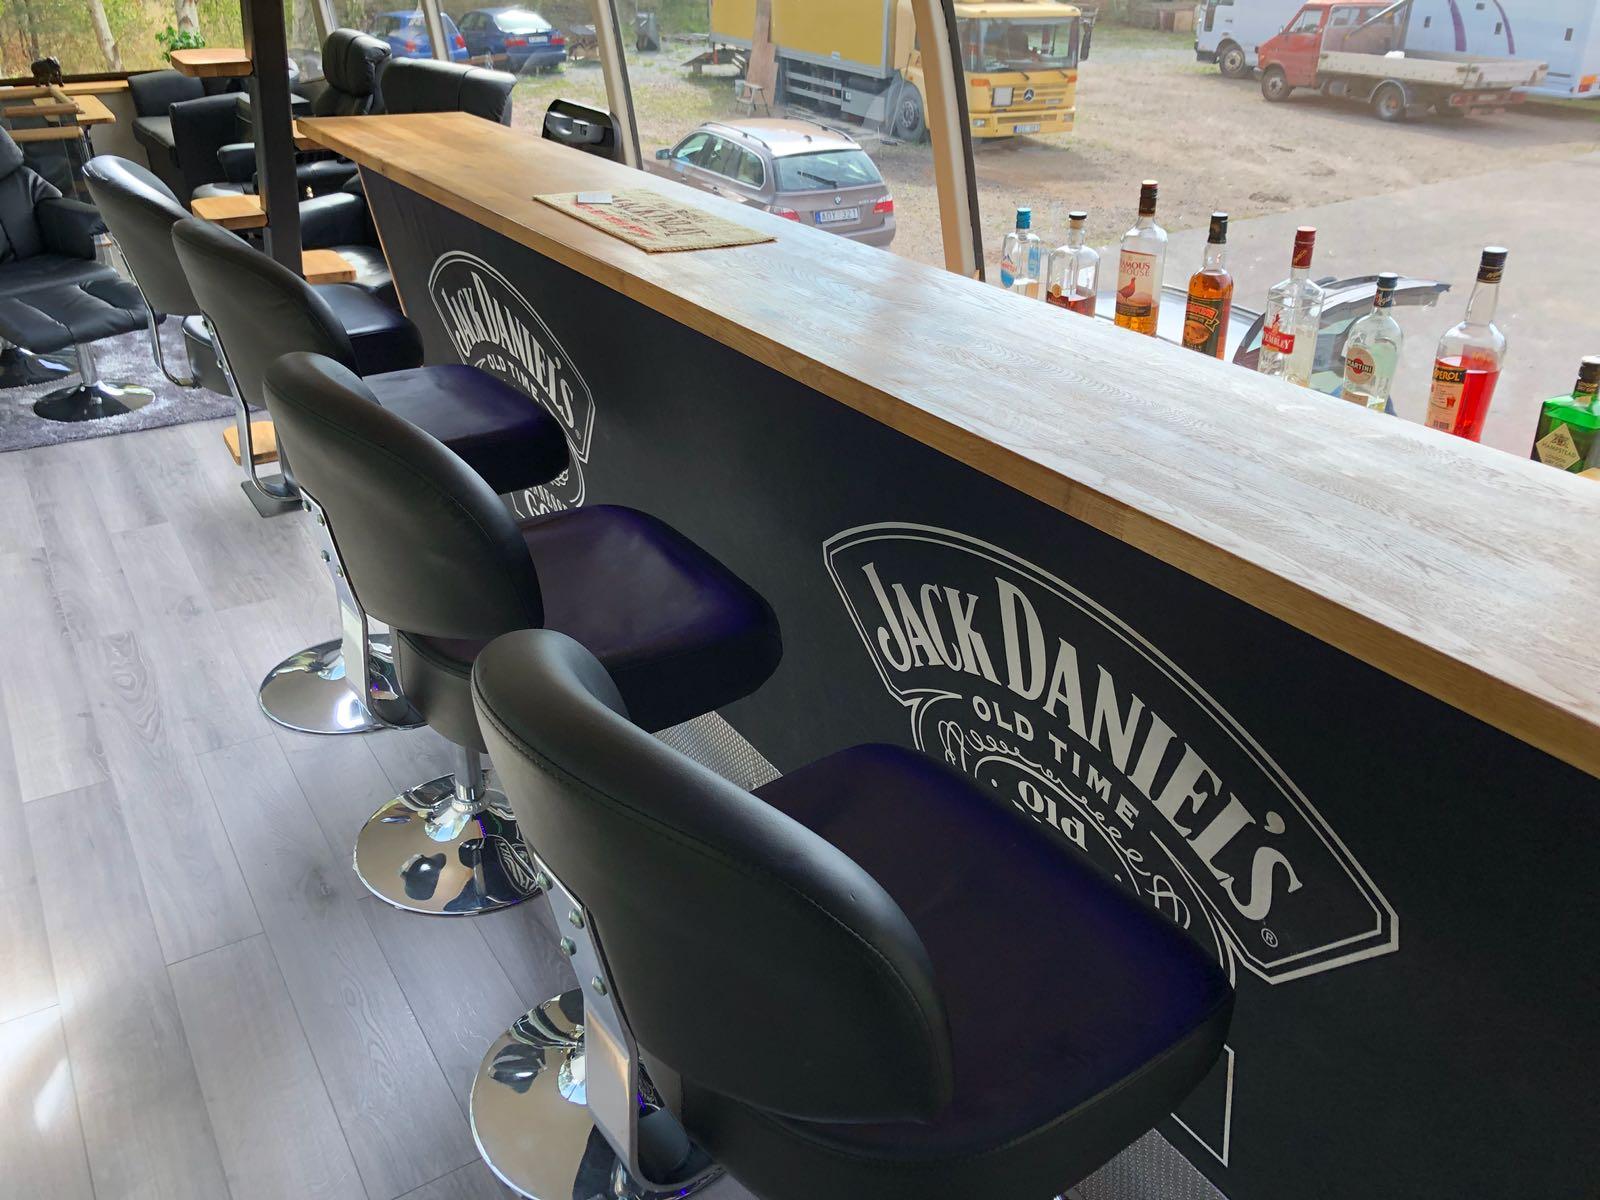 Jack Daniels Bar.